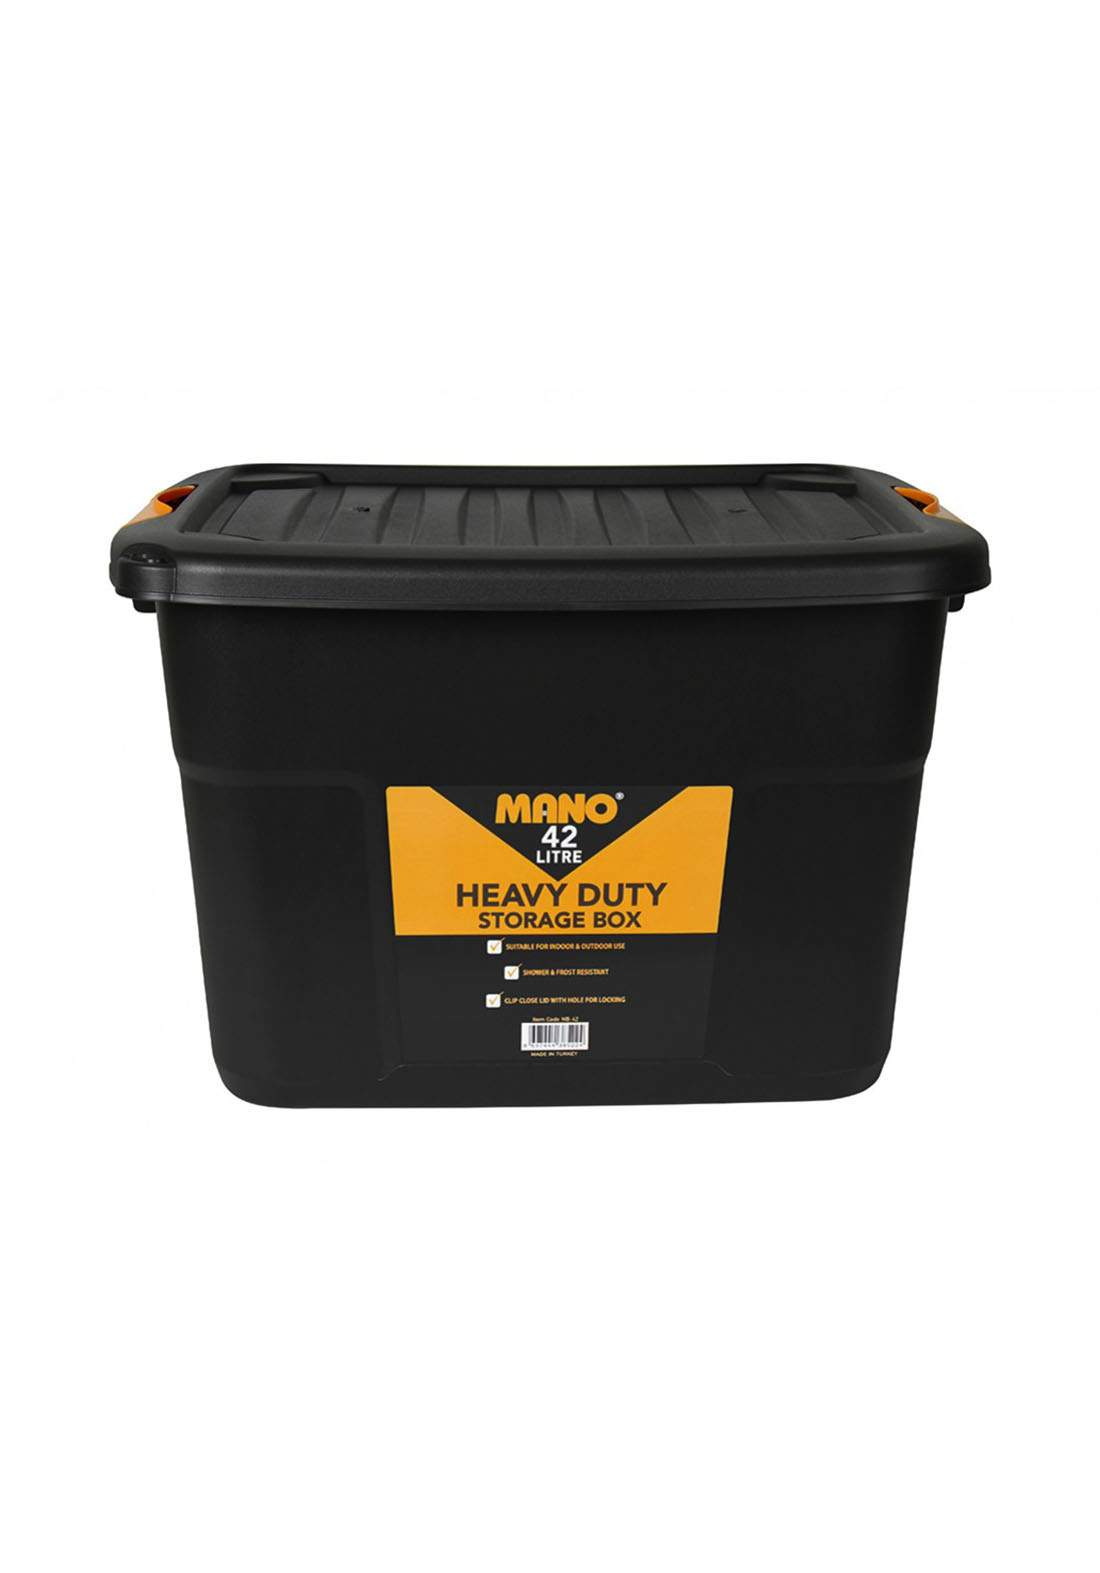 Mano NB-42 Storage Box 42L صندوق تخزين